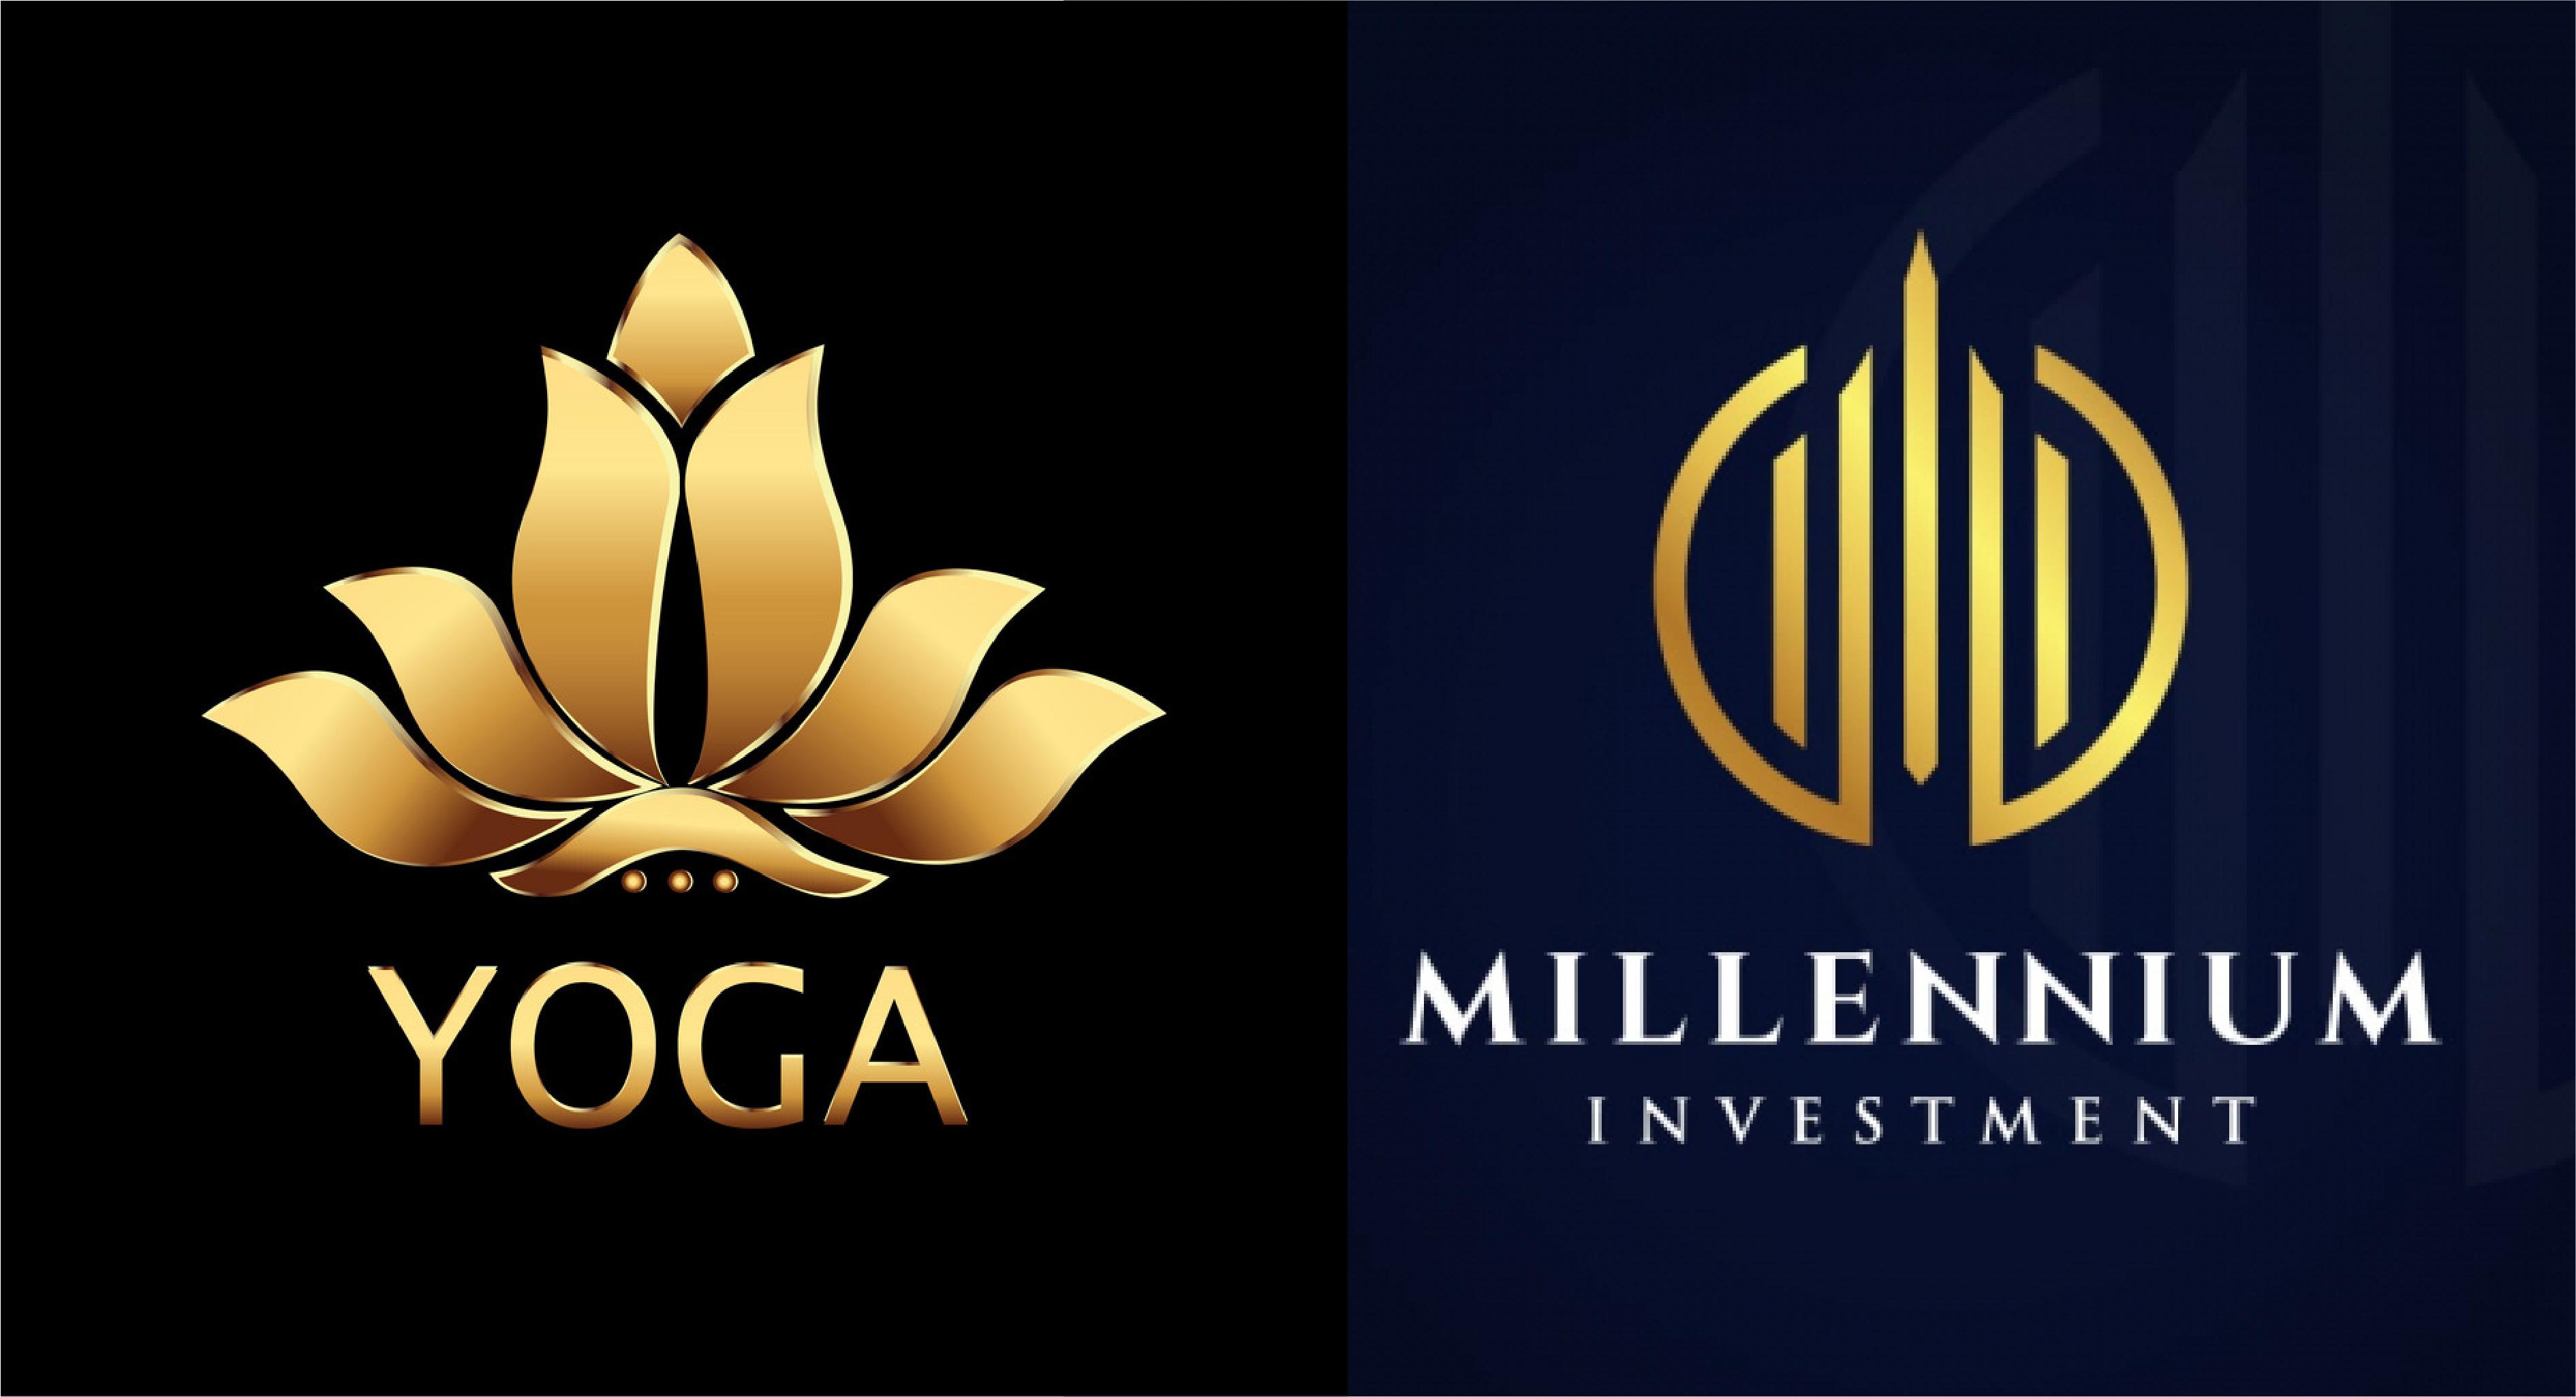 I will design world class Creative logo